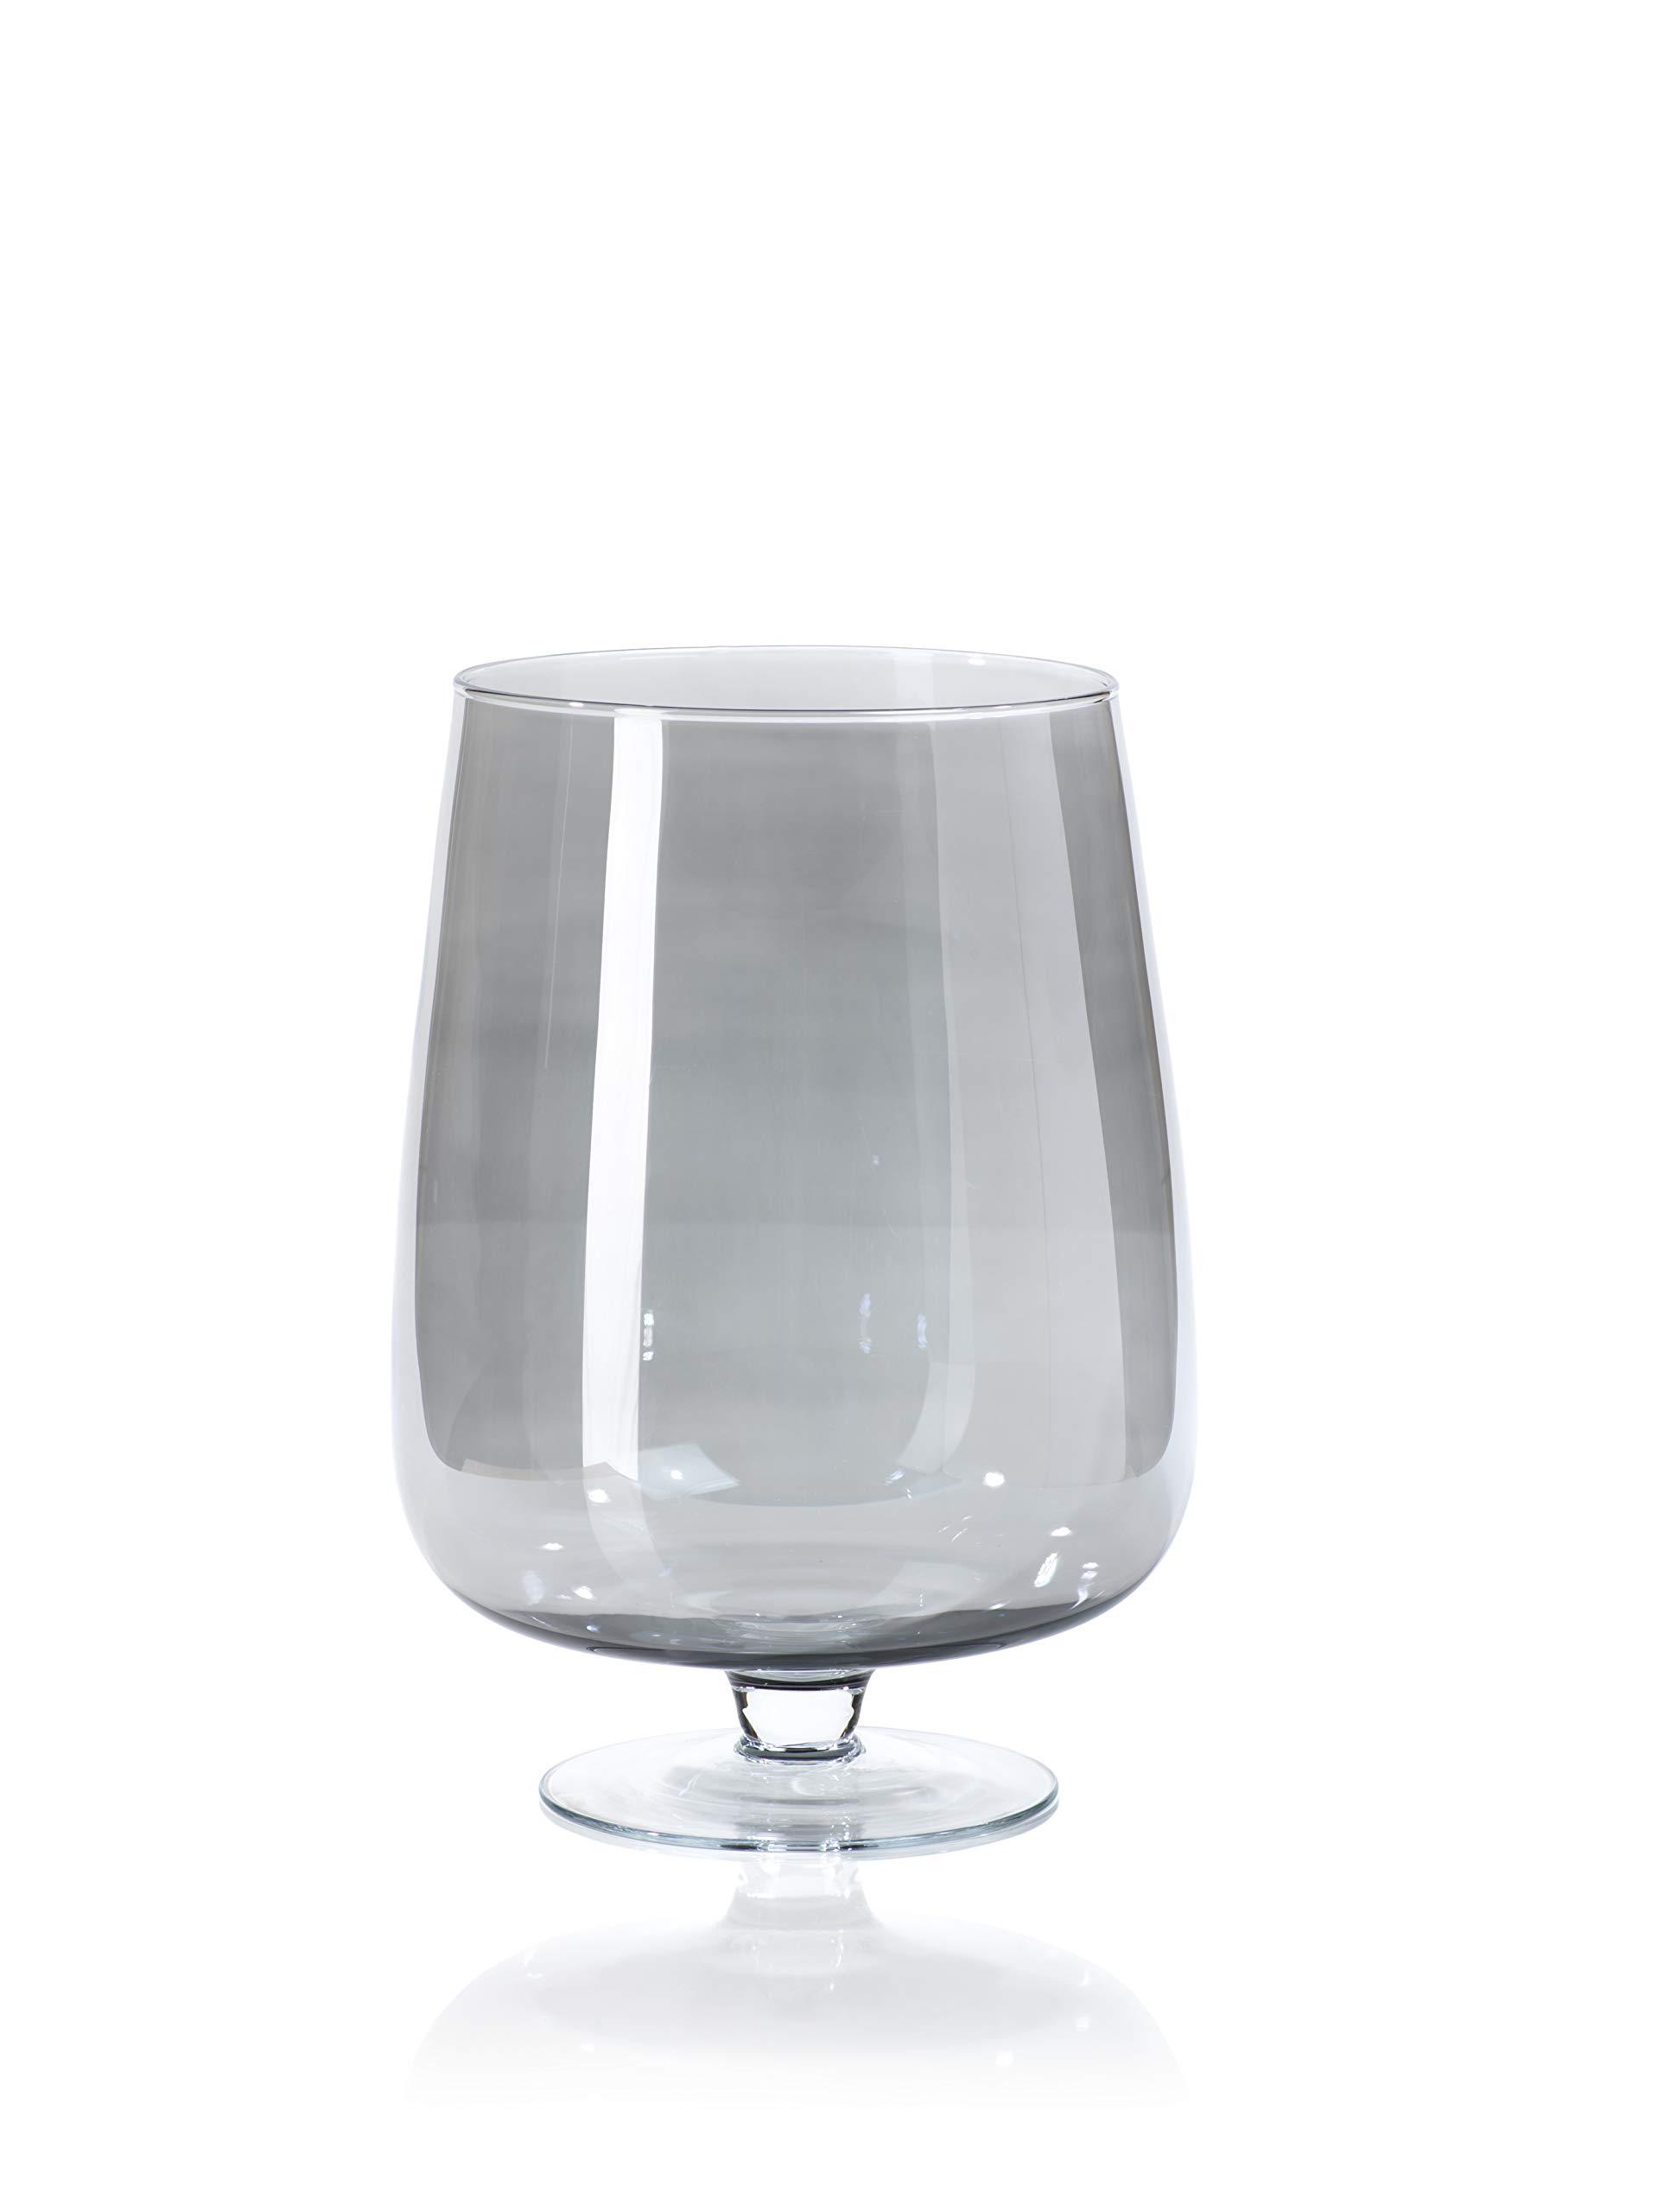 Zodax Shama Black Luster Glass Candle Holder, Large Hurricane, Gray